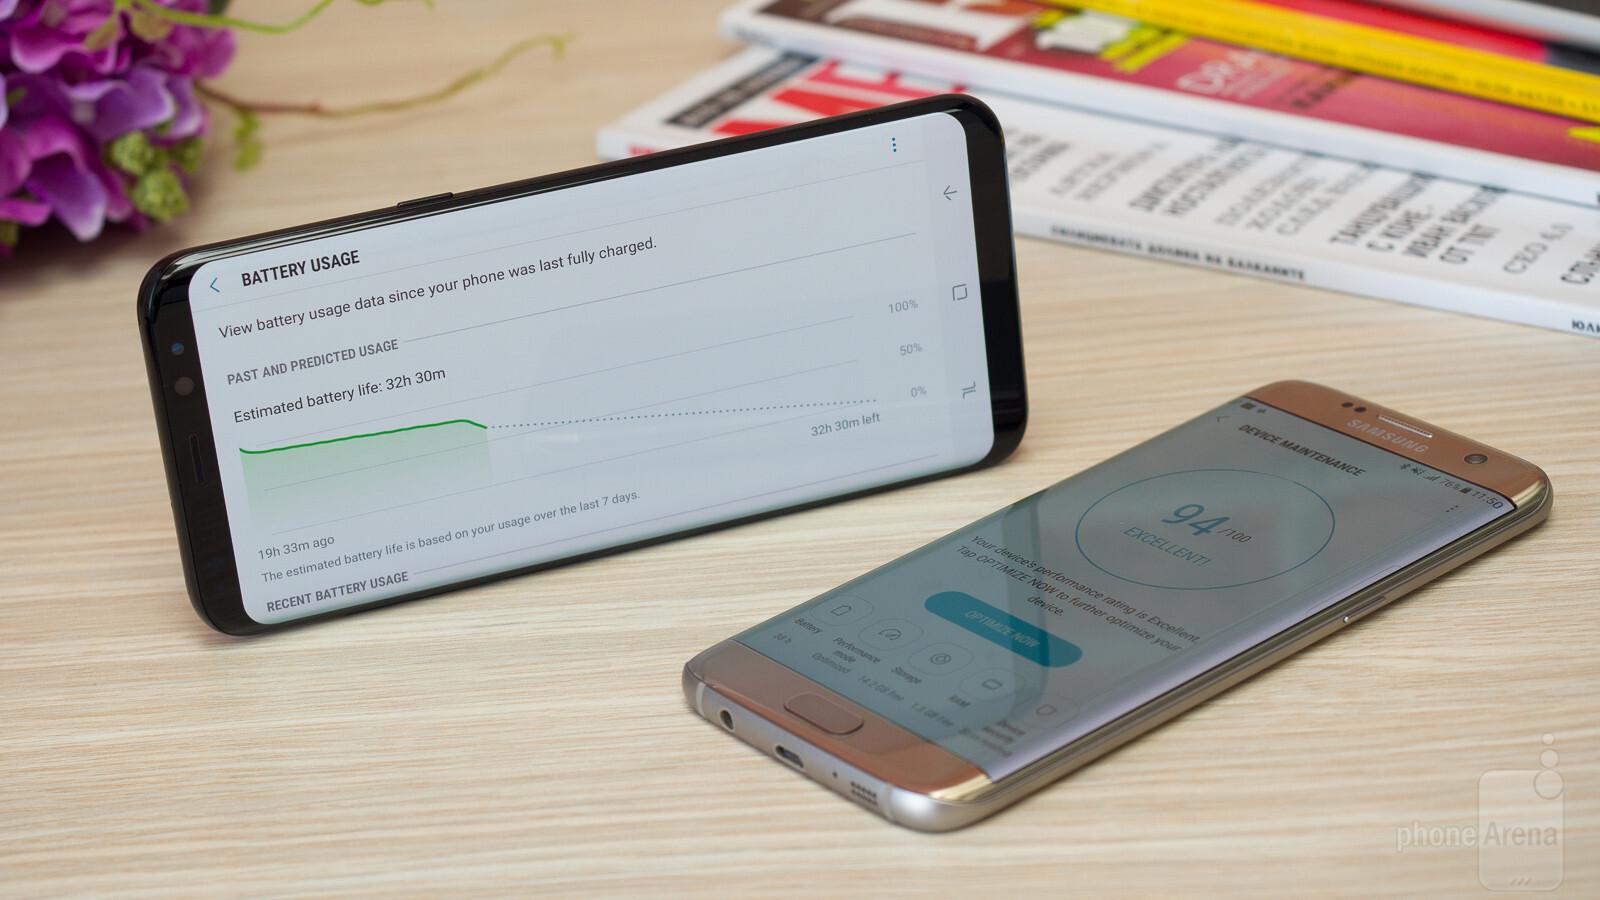 Samsung galaxy s7 edge screen auto rotate off caller id 1